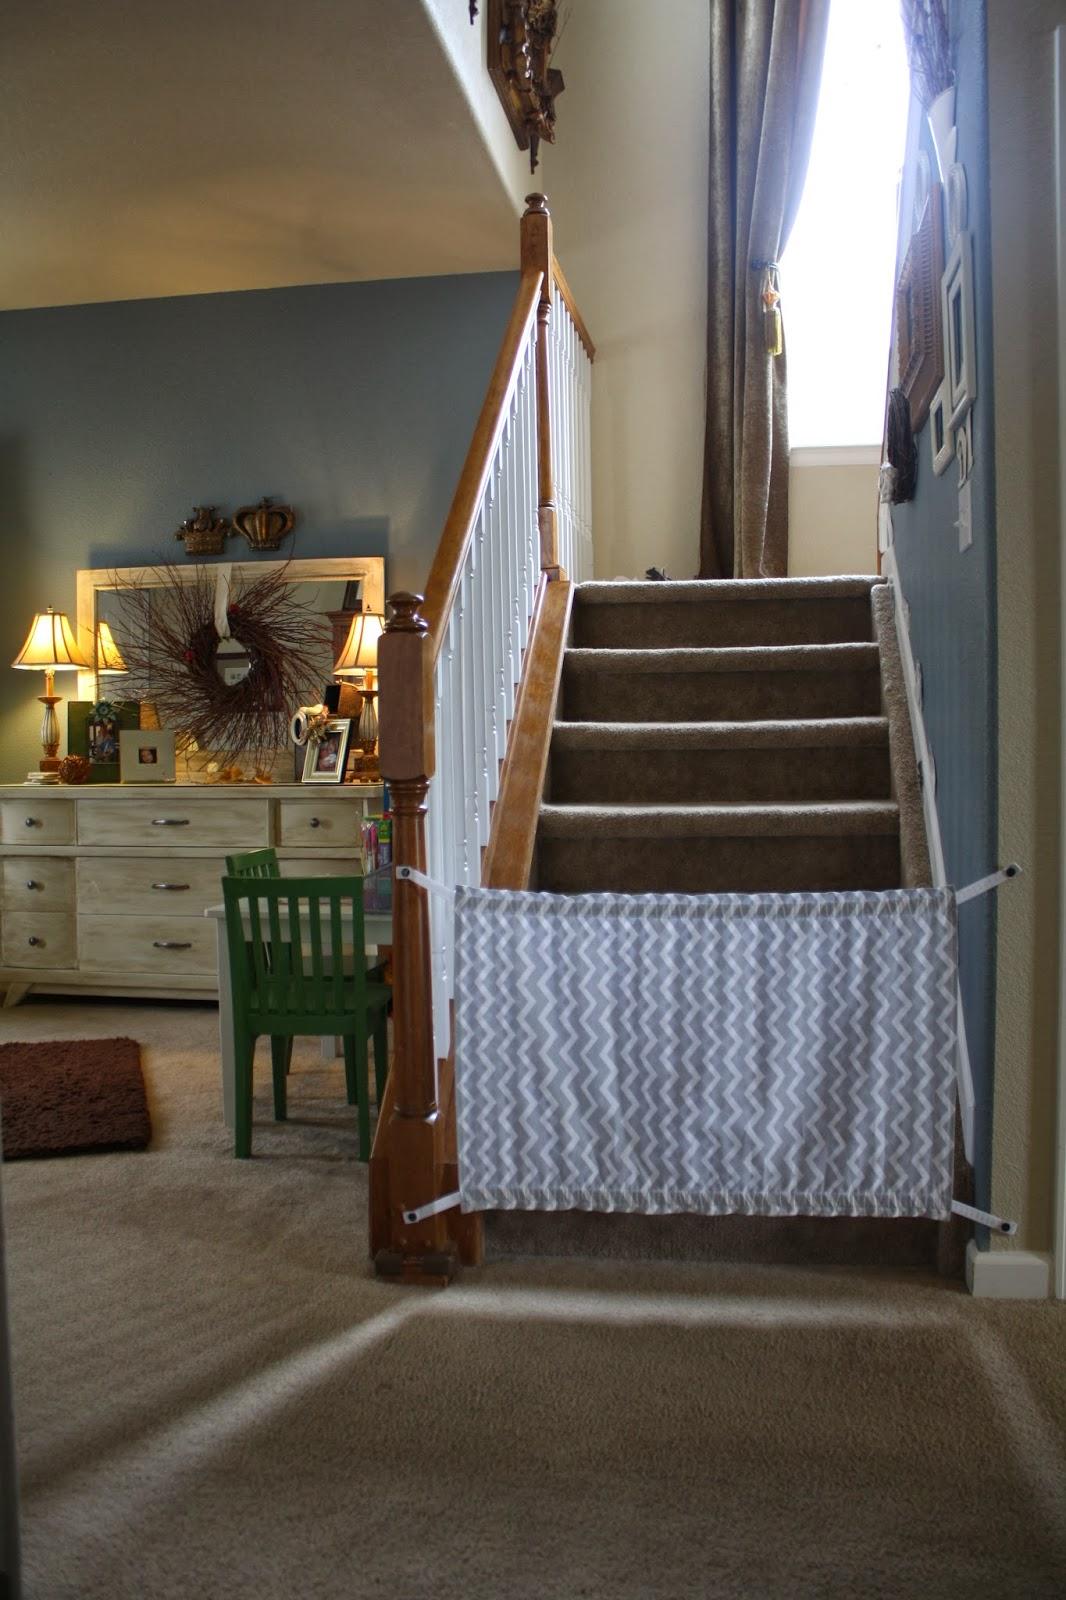 Mccash Family Blog Homemade Baby Gate A Tutorial